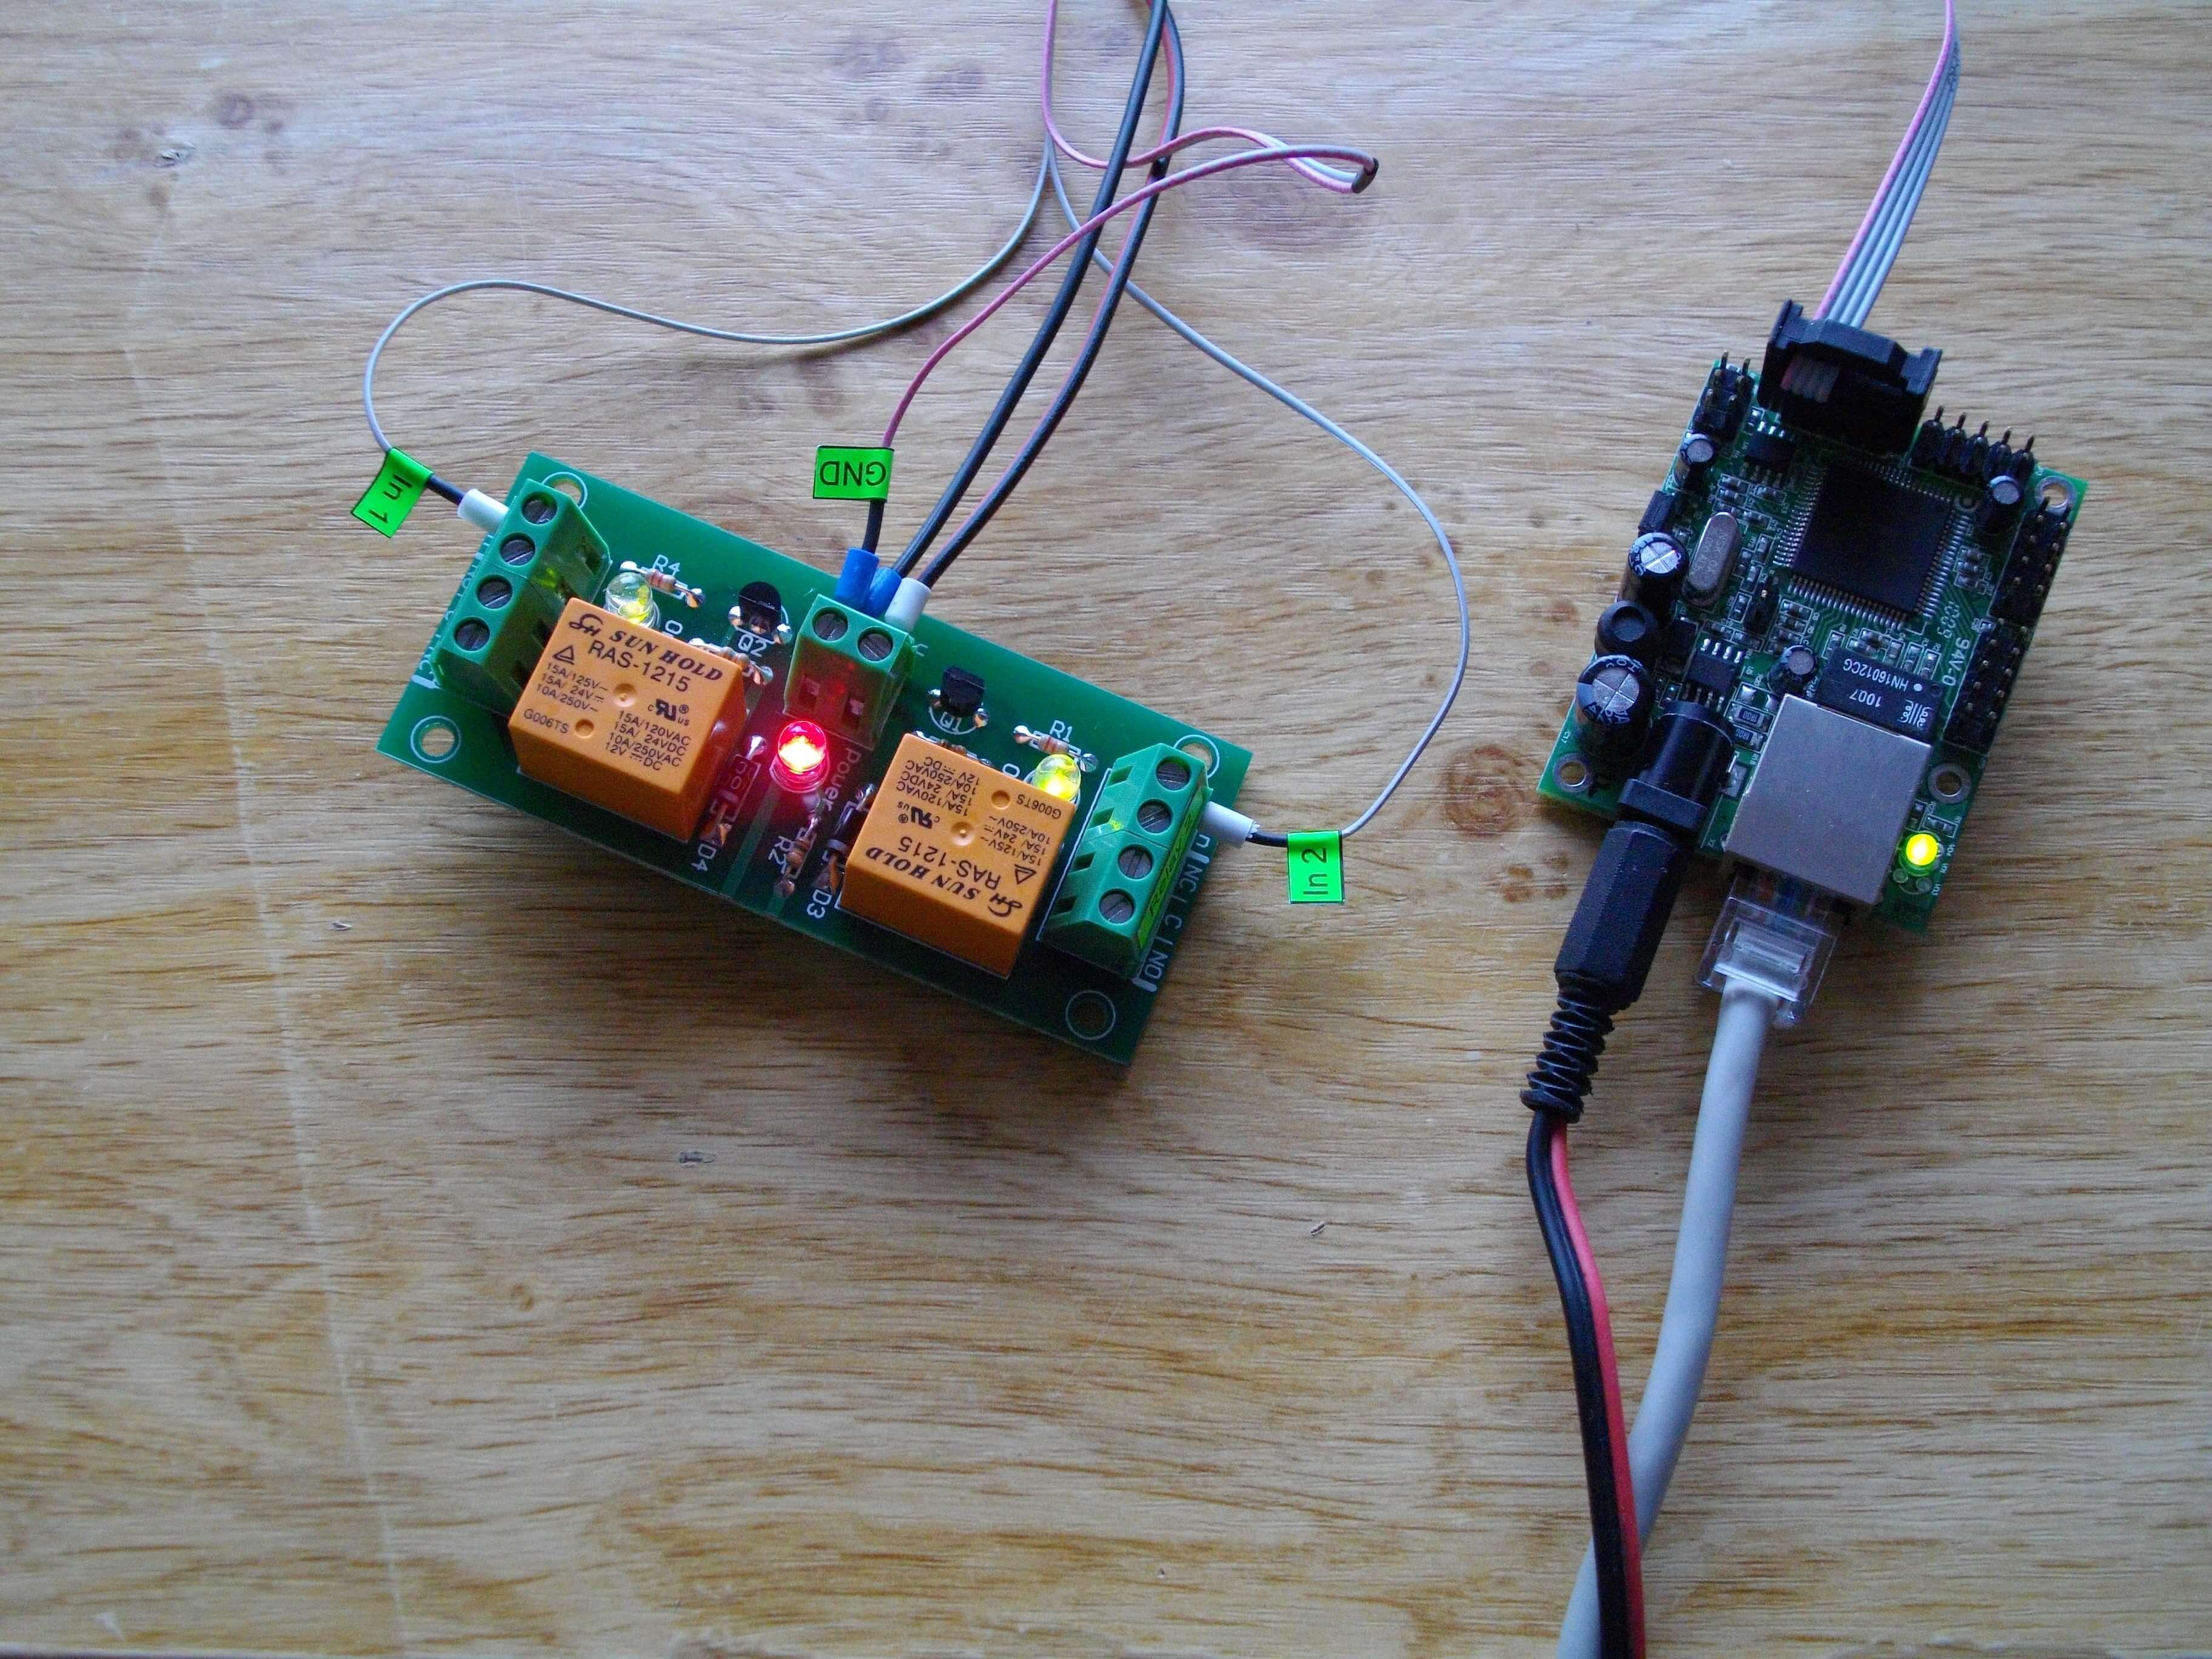 DAEnetIP2 and Relay Board